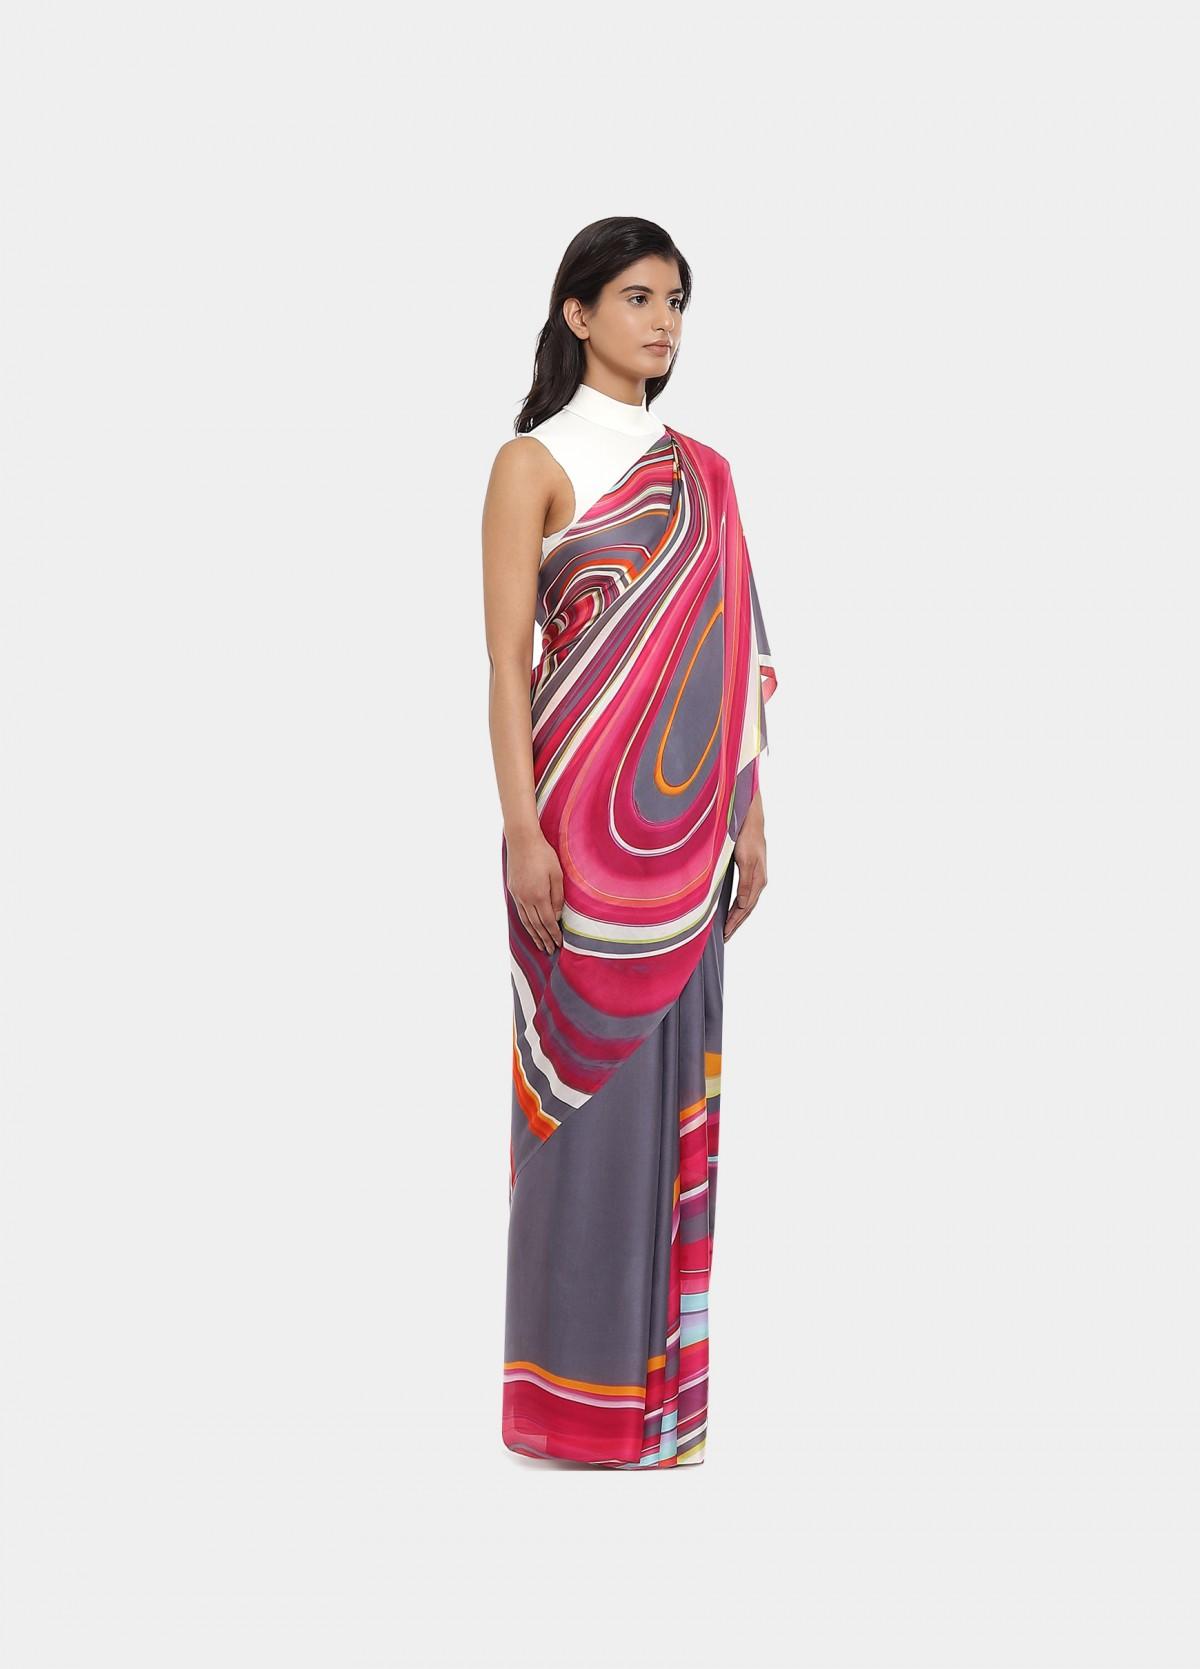 The Strawberry Fields Sari